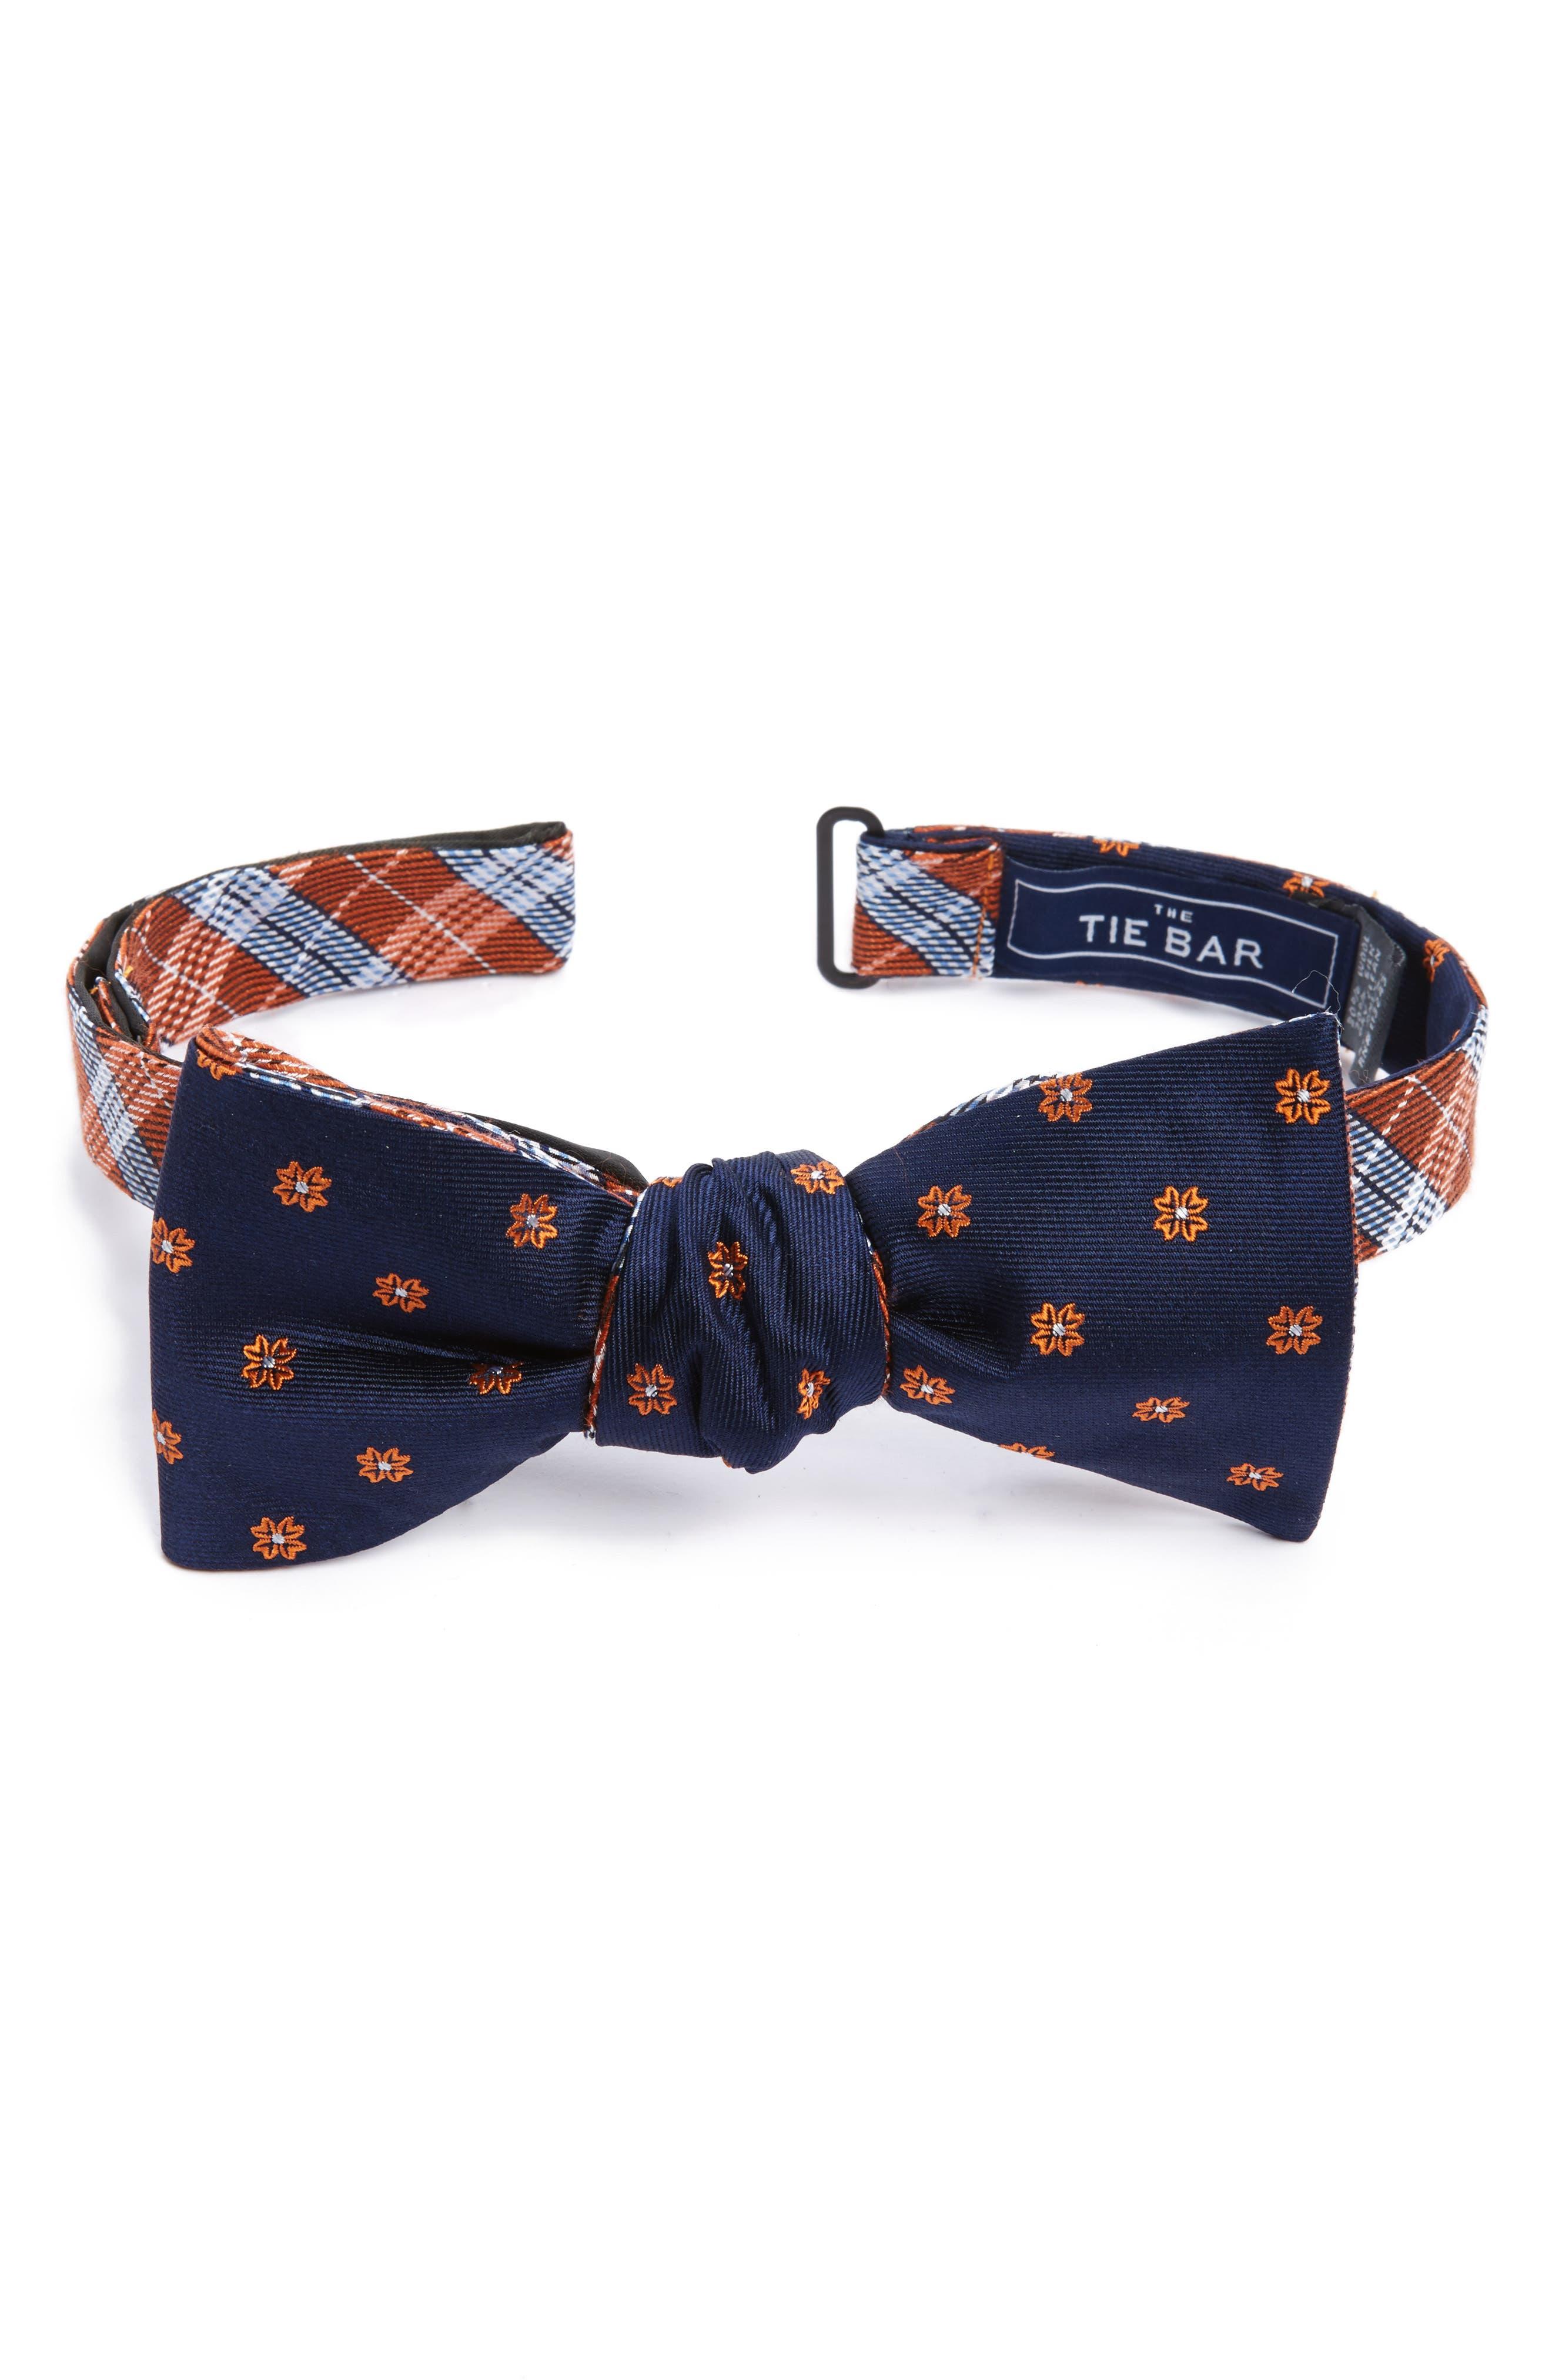 The Tie Bar Emerson Reversible Silk Bow Tie